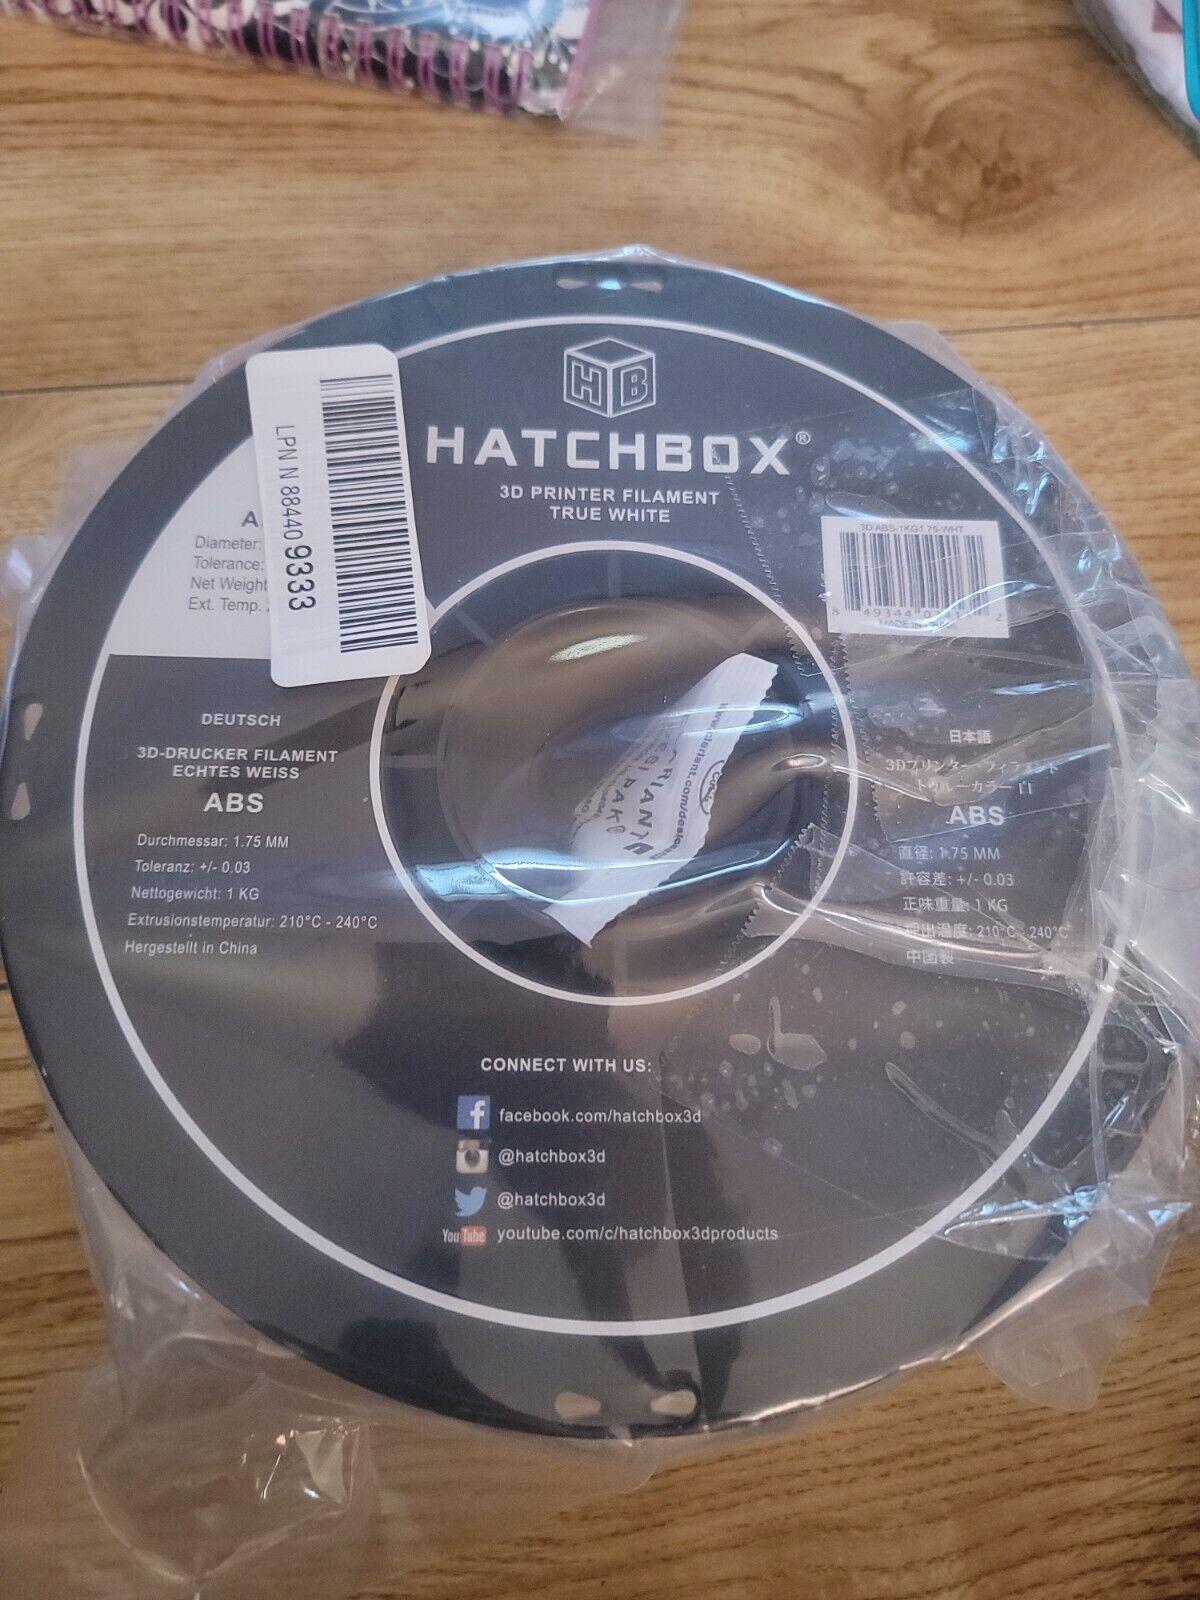 HATCHBOX ABS 1.75 mm 3D Printer Filament in White, 1kg Spool